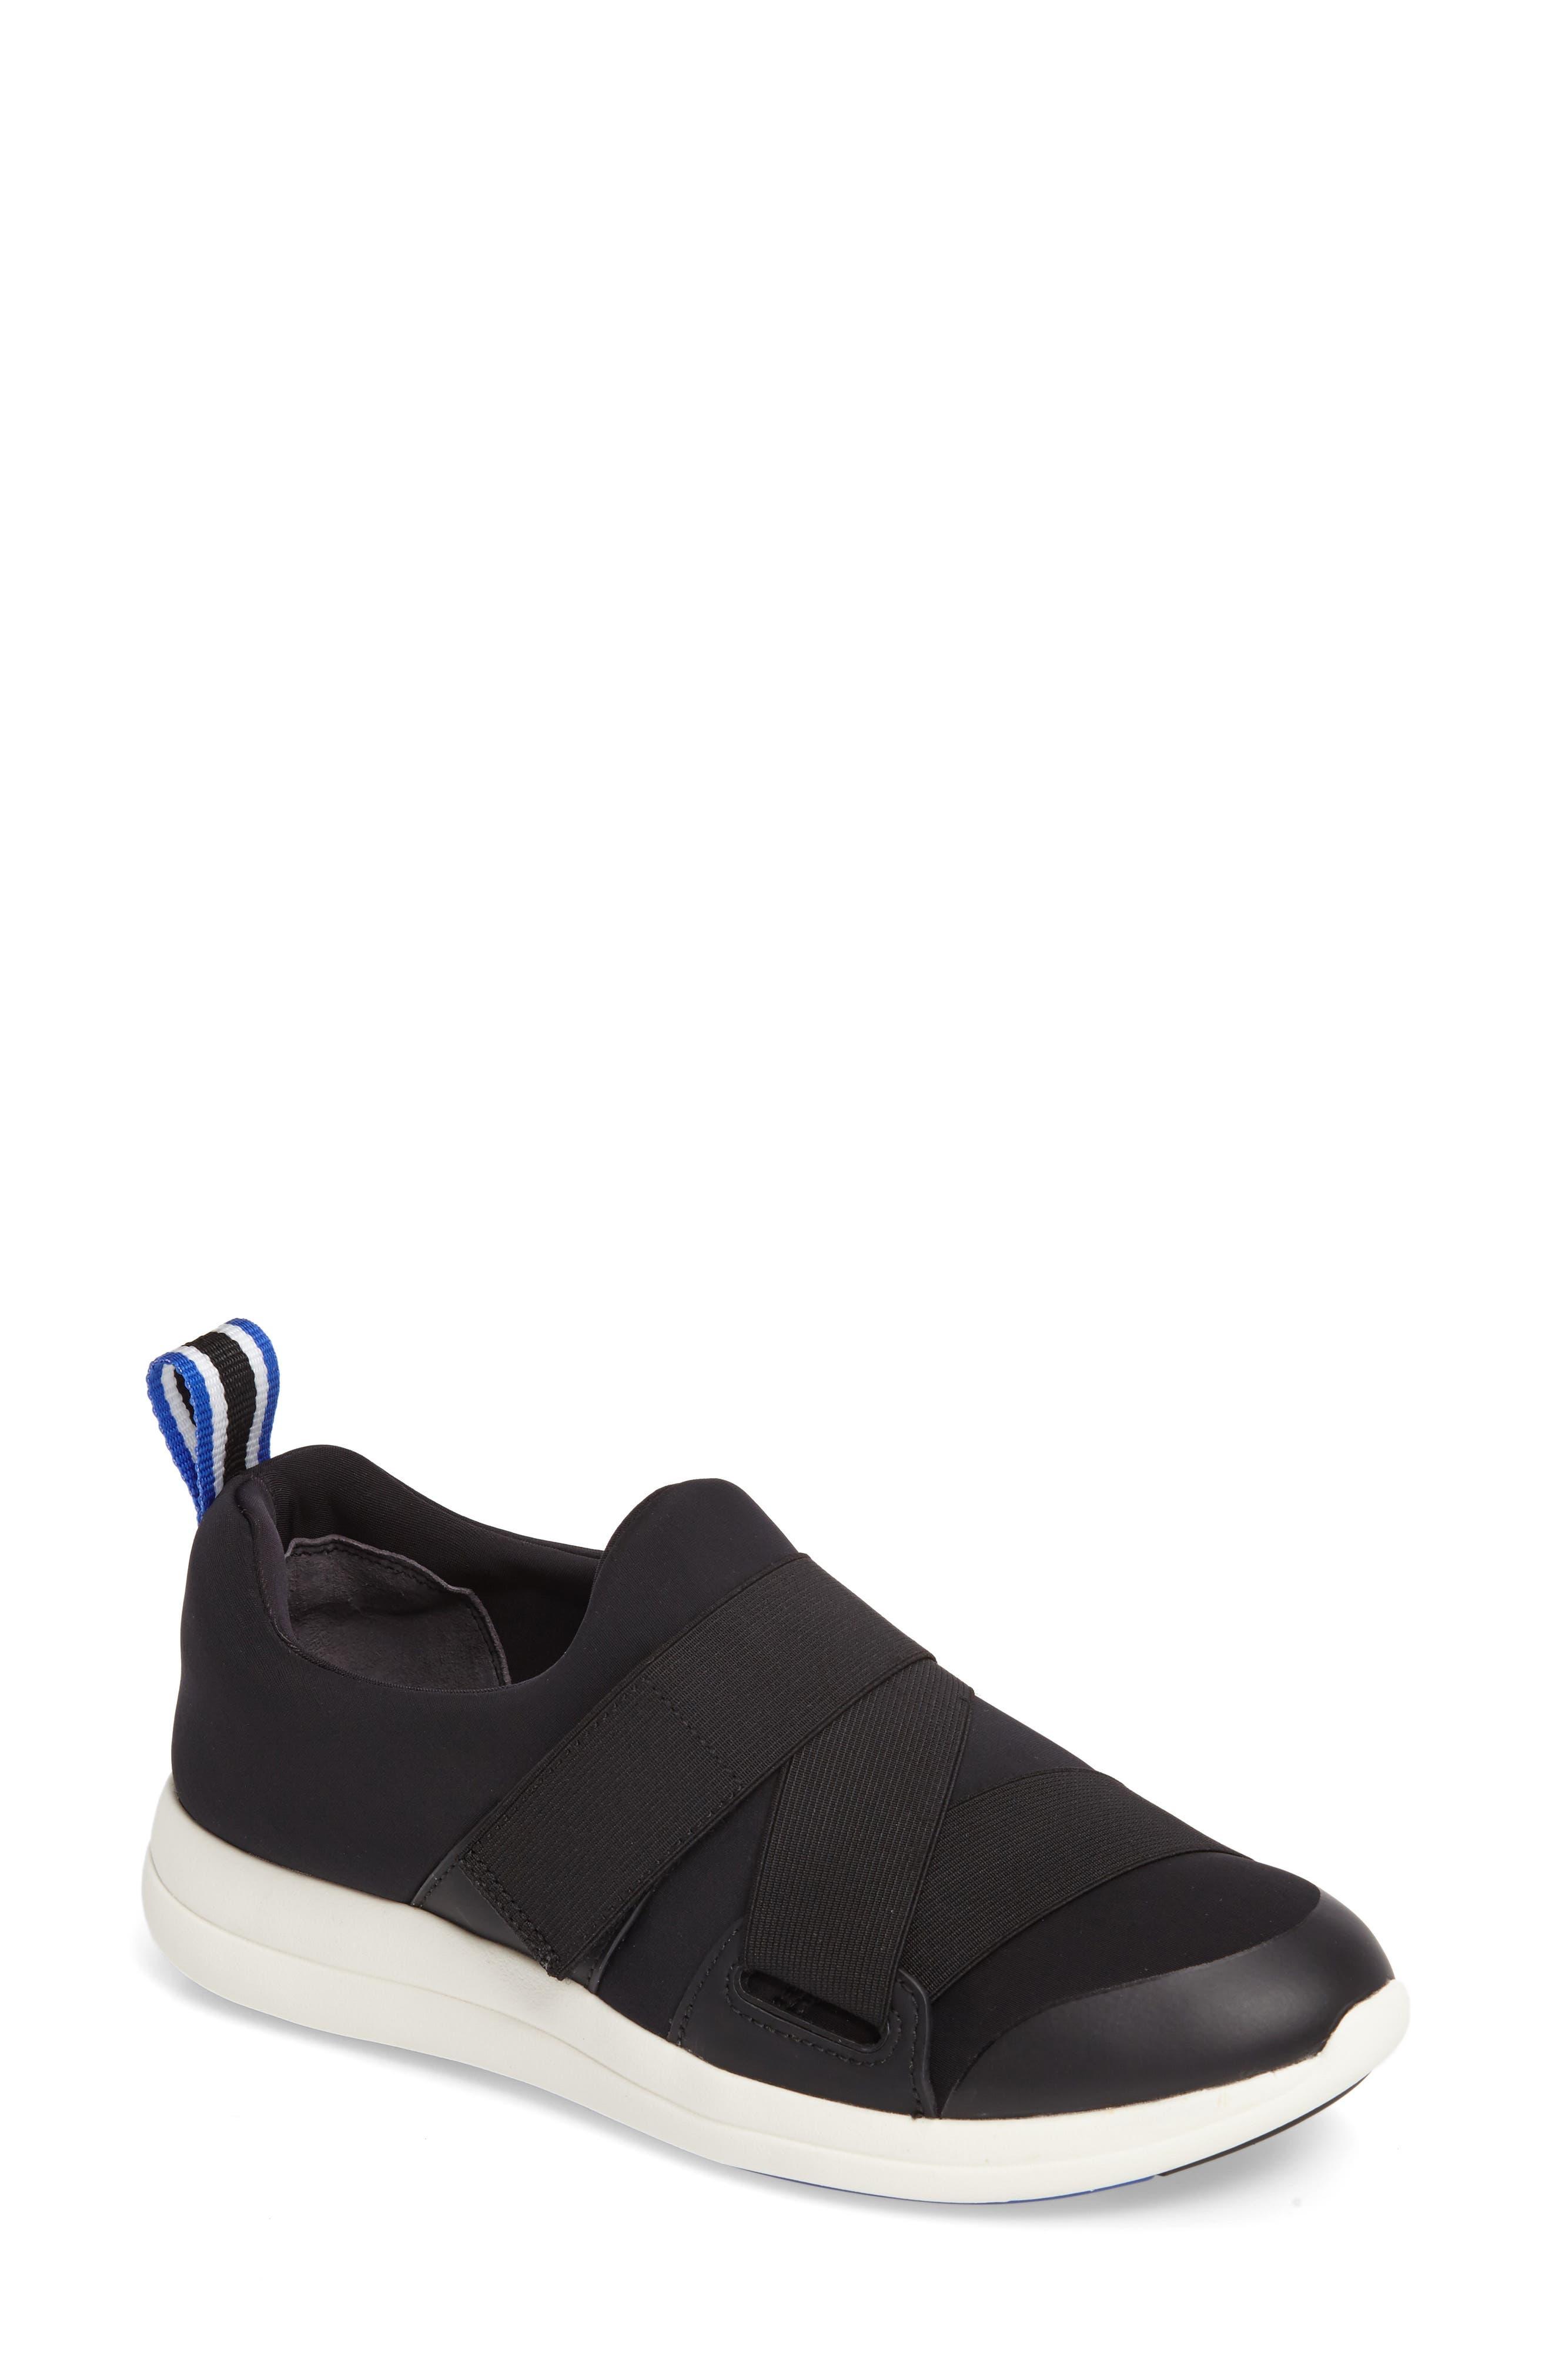 TORY SPORT Stretch Sneaker